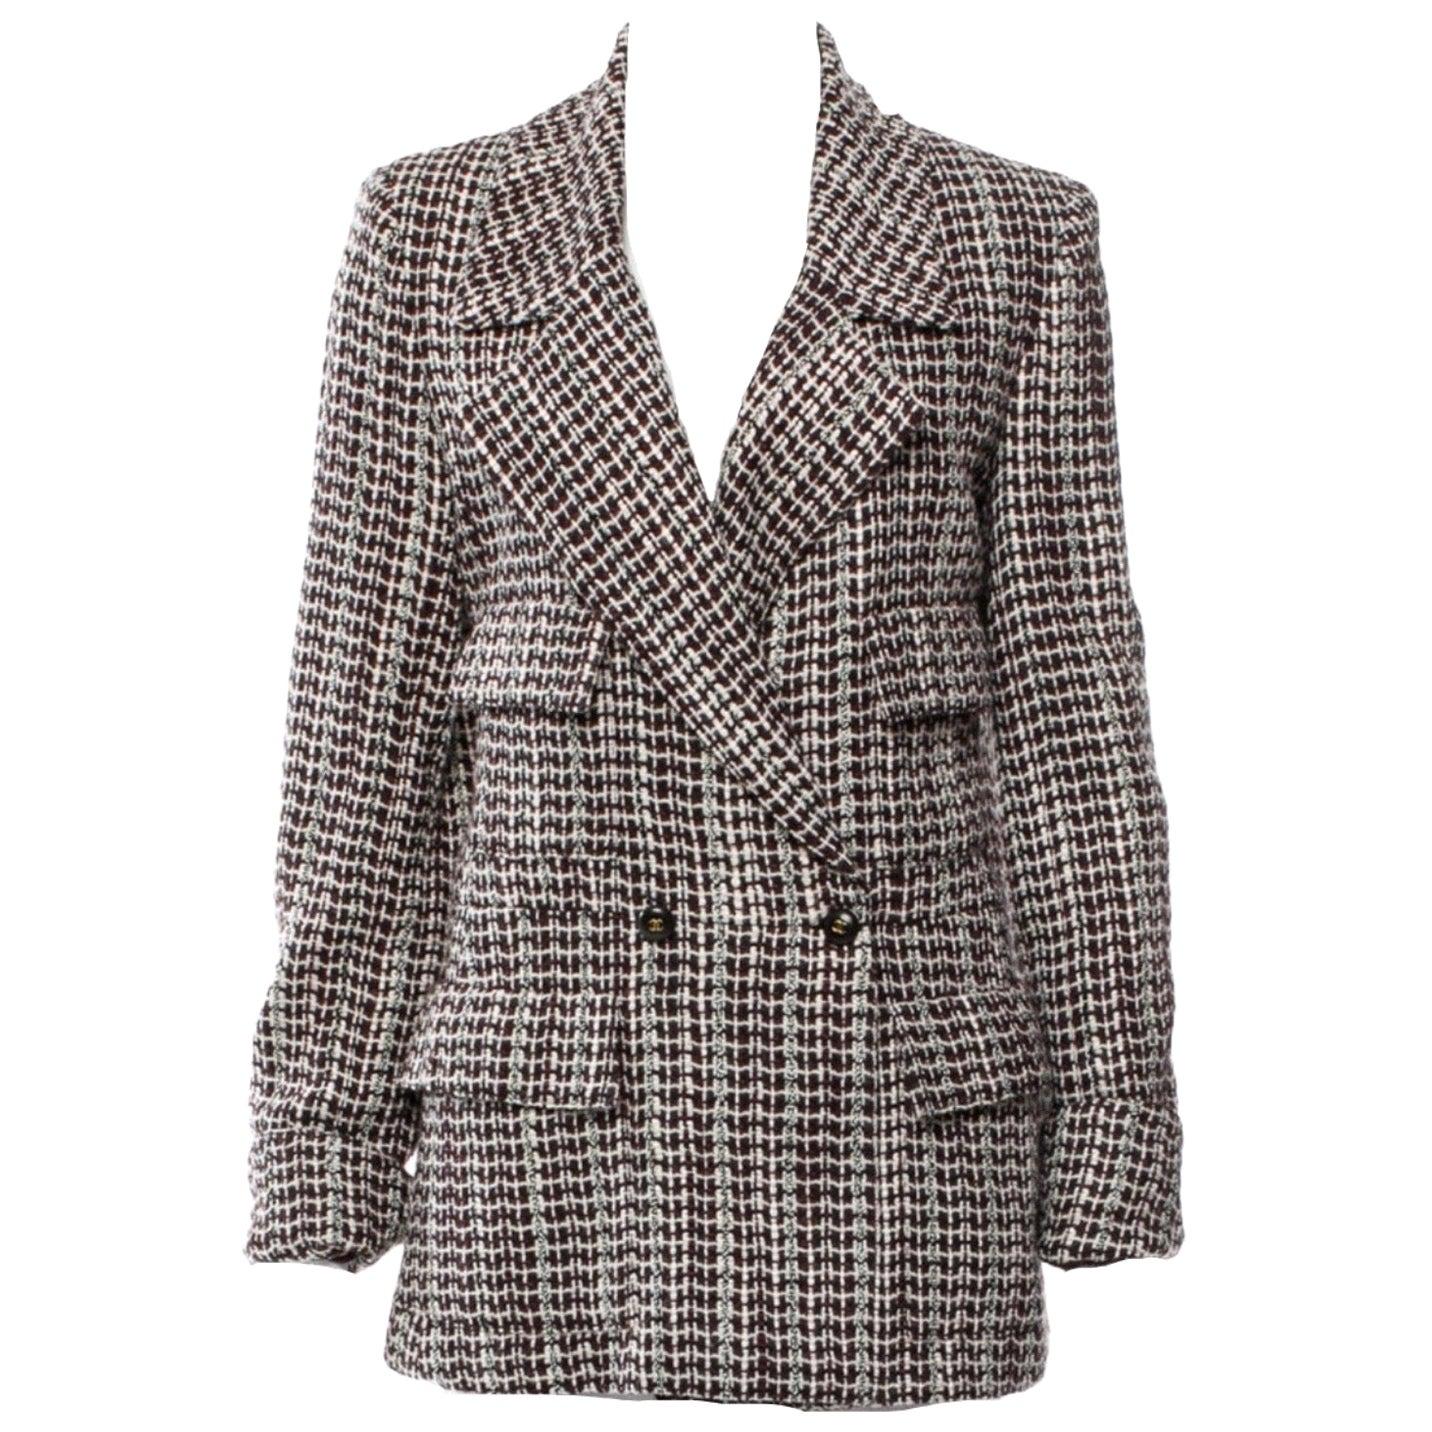 UNWORN Chanel Tweed & Sequins CC Logo Button Short Coat Jacket Blazer